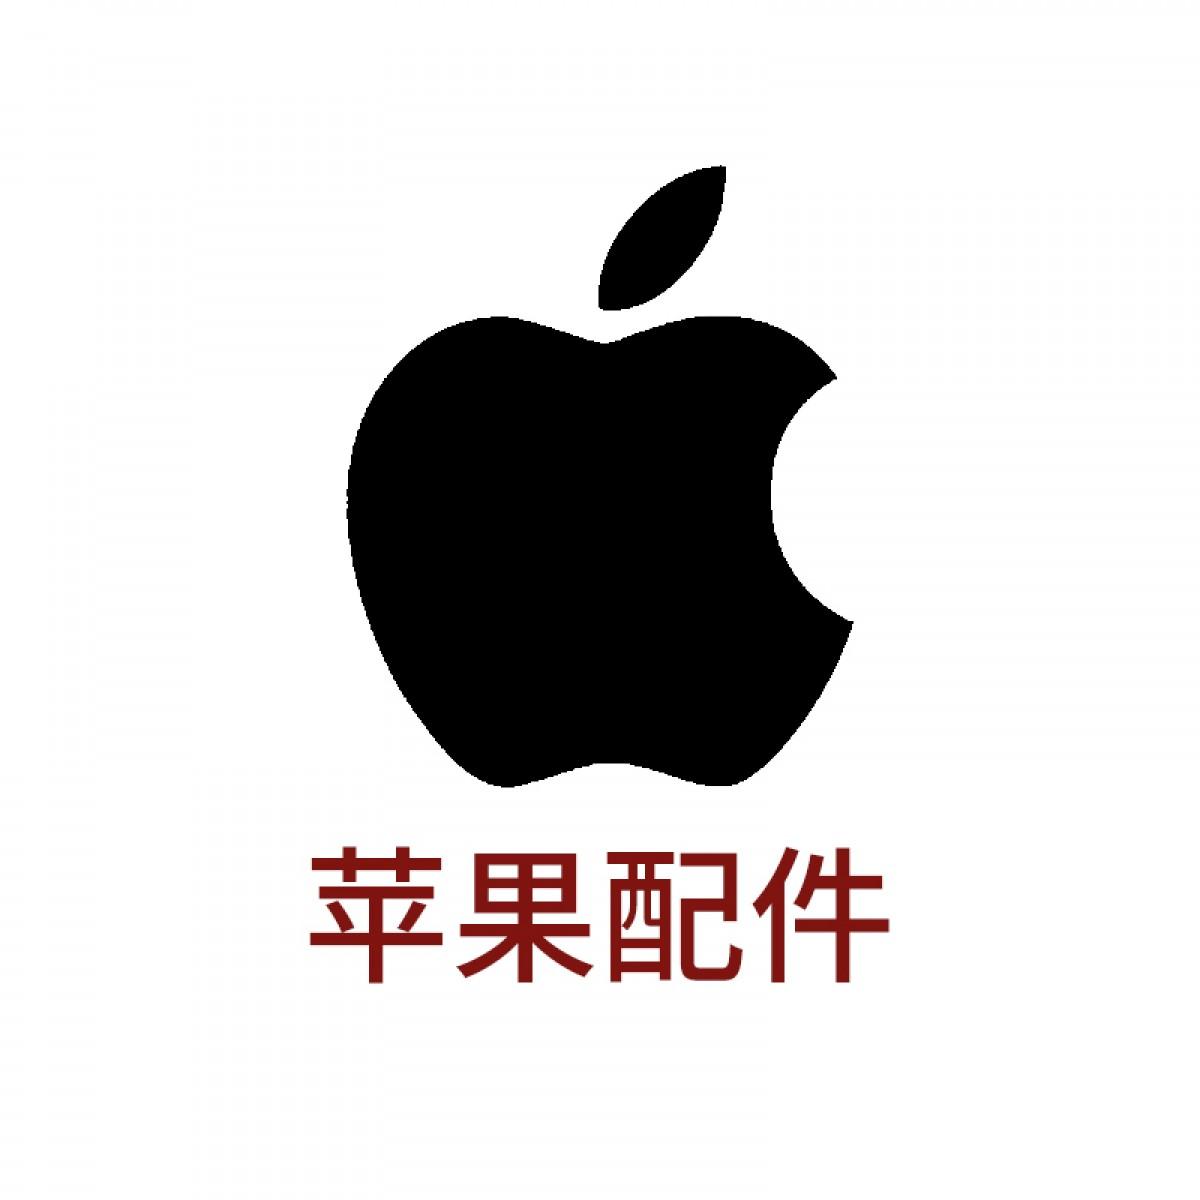 iPhone7G苹果拆机扬声器